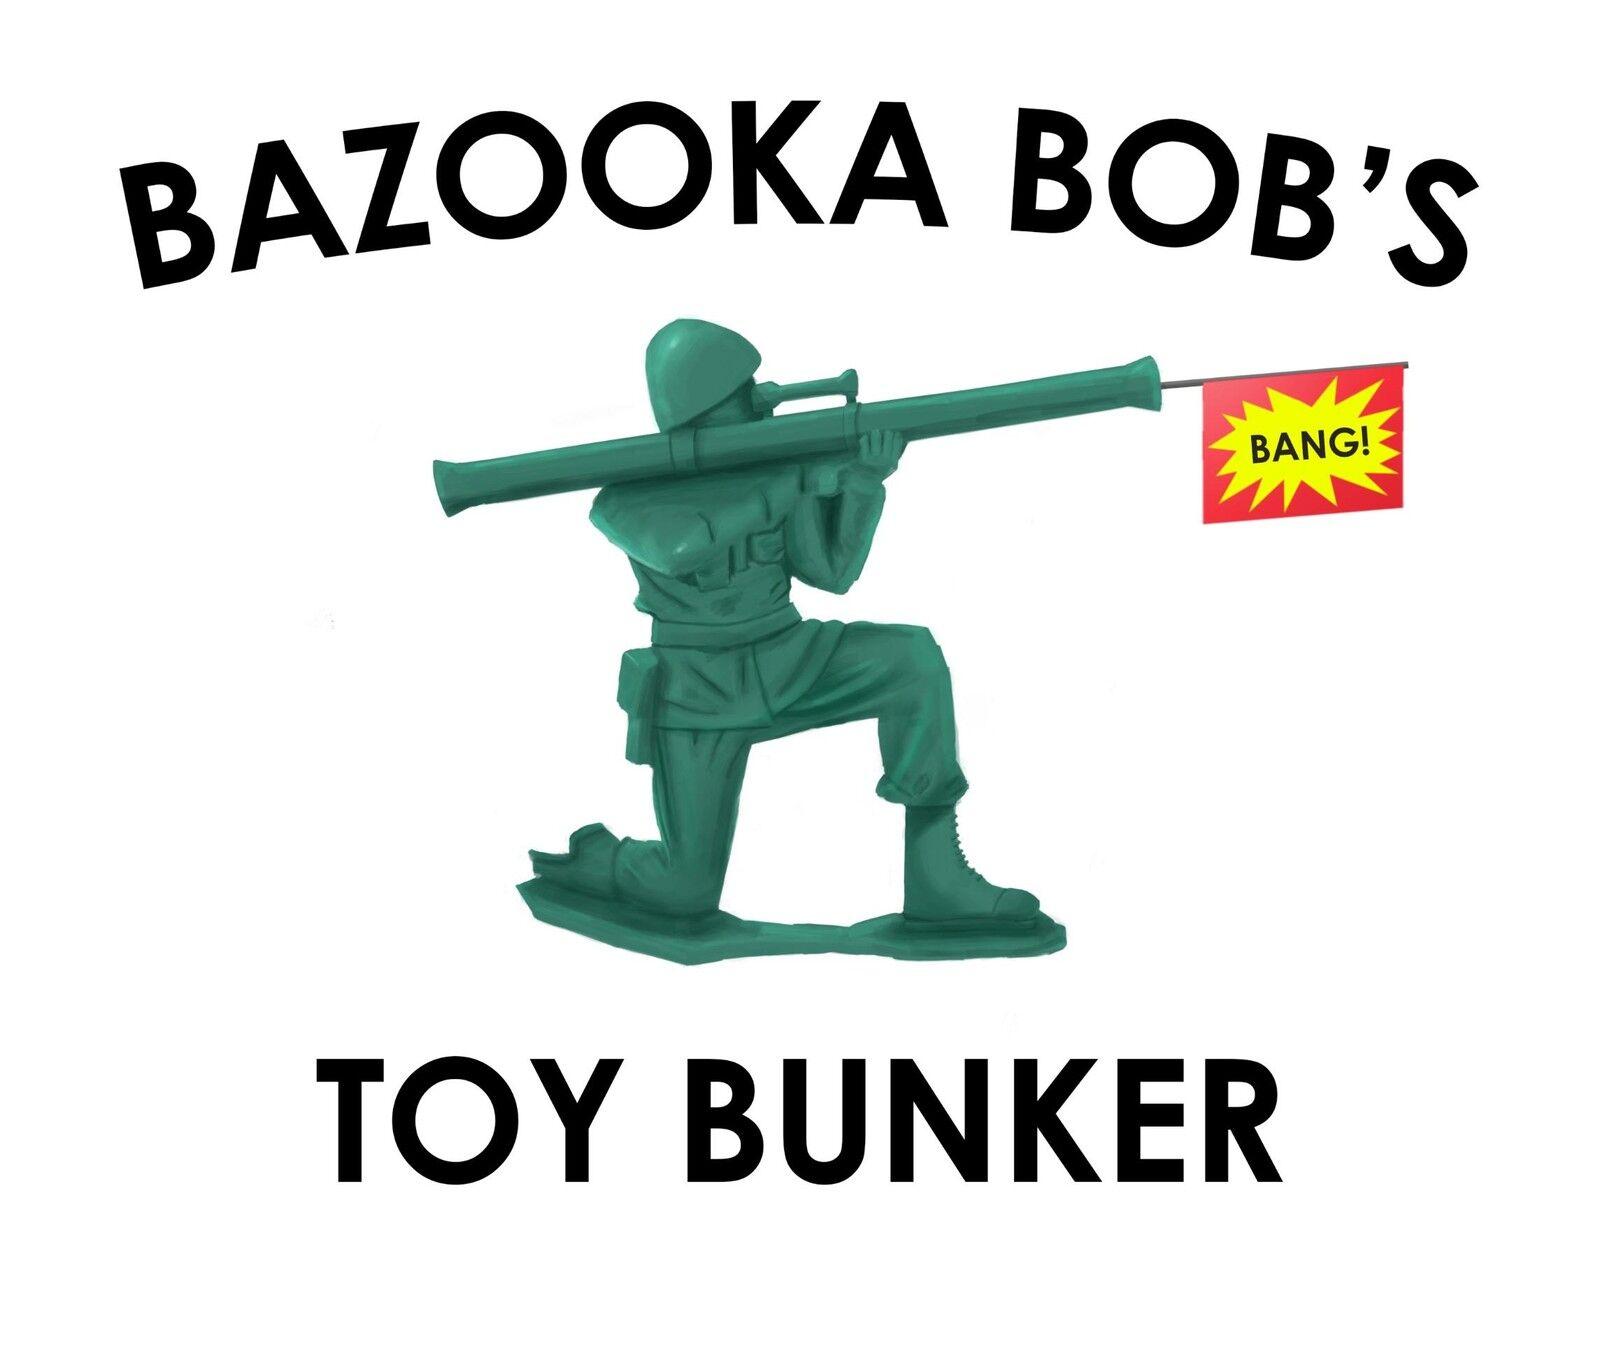 Bazooka Bob's Toy Bunker